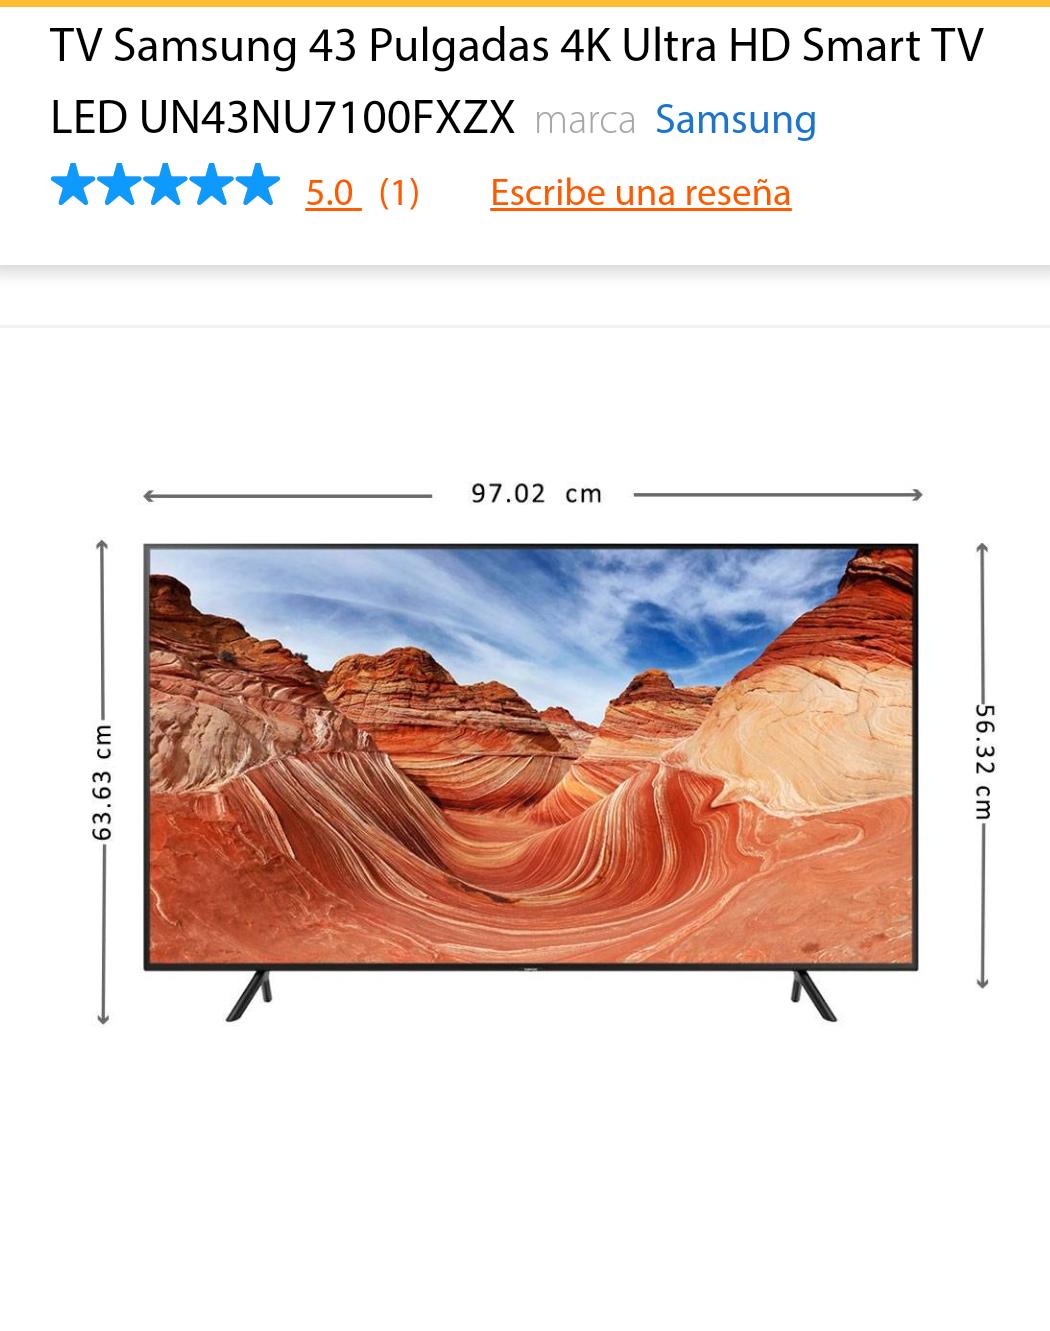 Cyber Monday en Walmart: Pantalla Samsung 43'' 4K Ultra HD Smart TV LED UN43NU7100FXZX